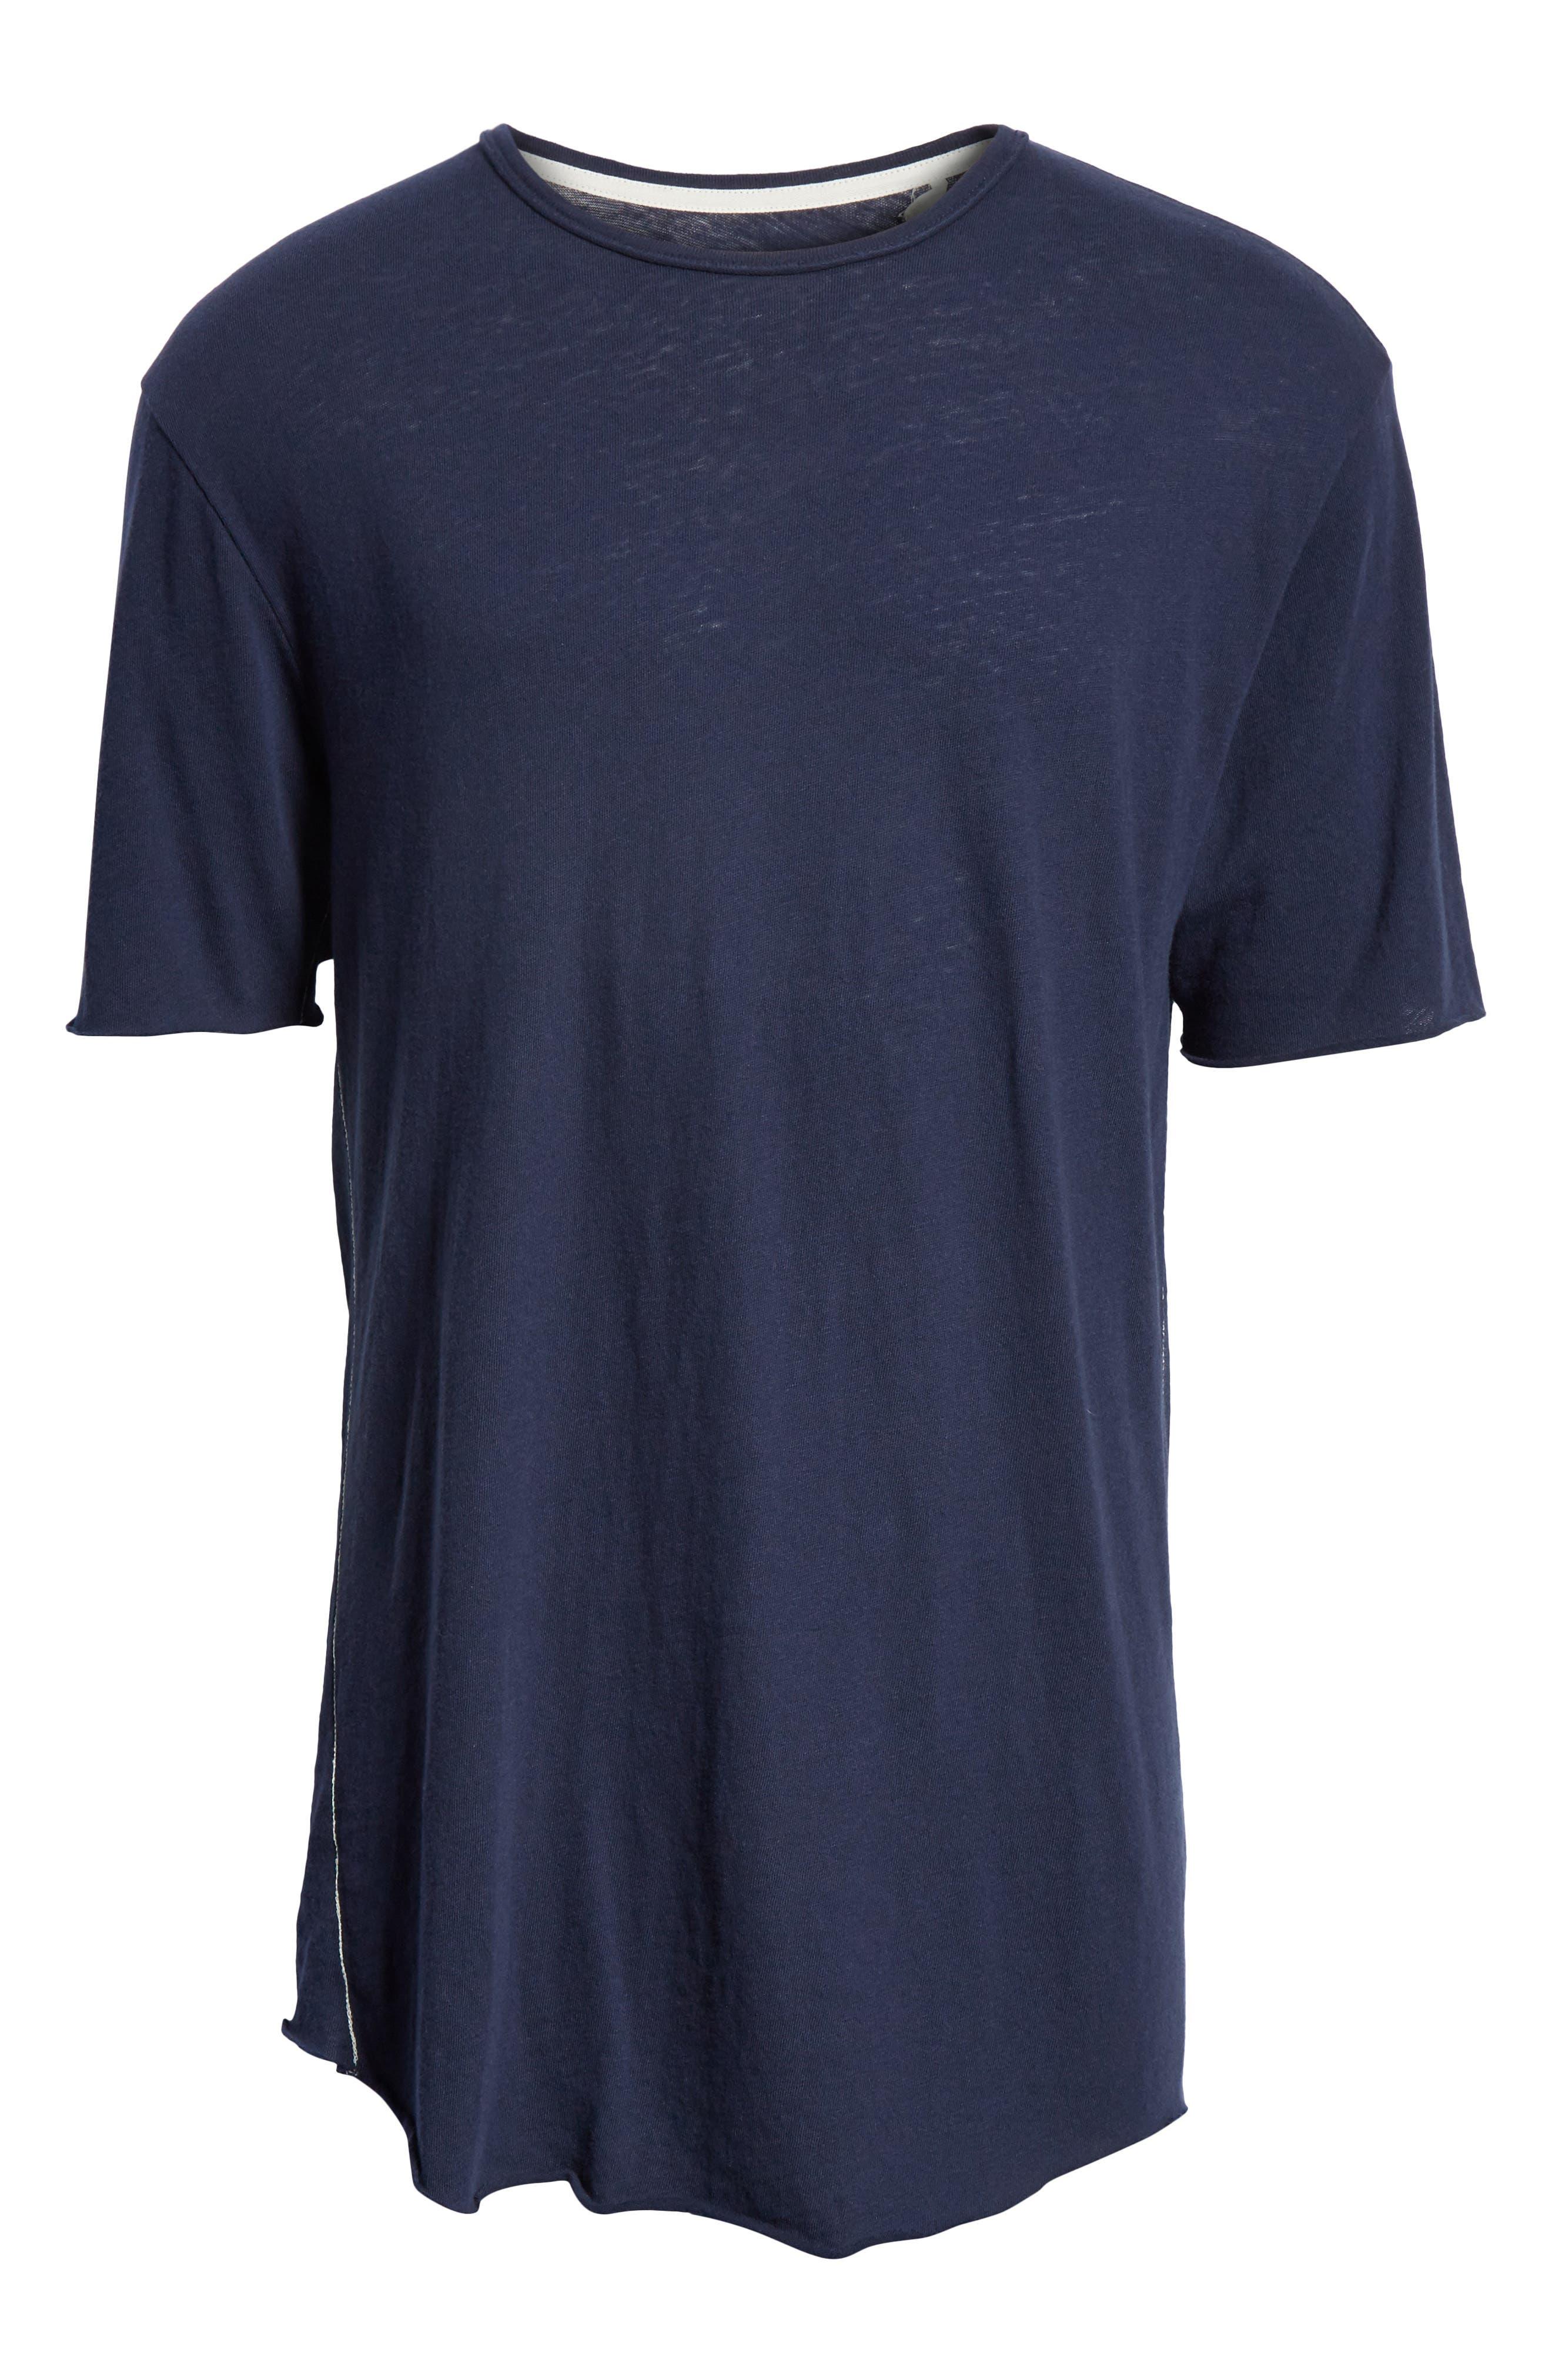 RAG & BONE,                             Hartley Crewneck Cotton & Linen T-Shirt,                             Alternate thumbnail 6, color,                             410